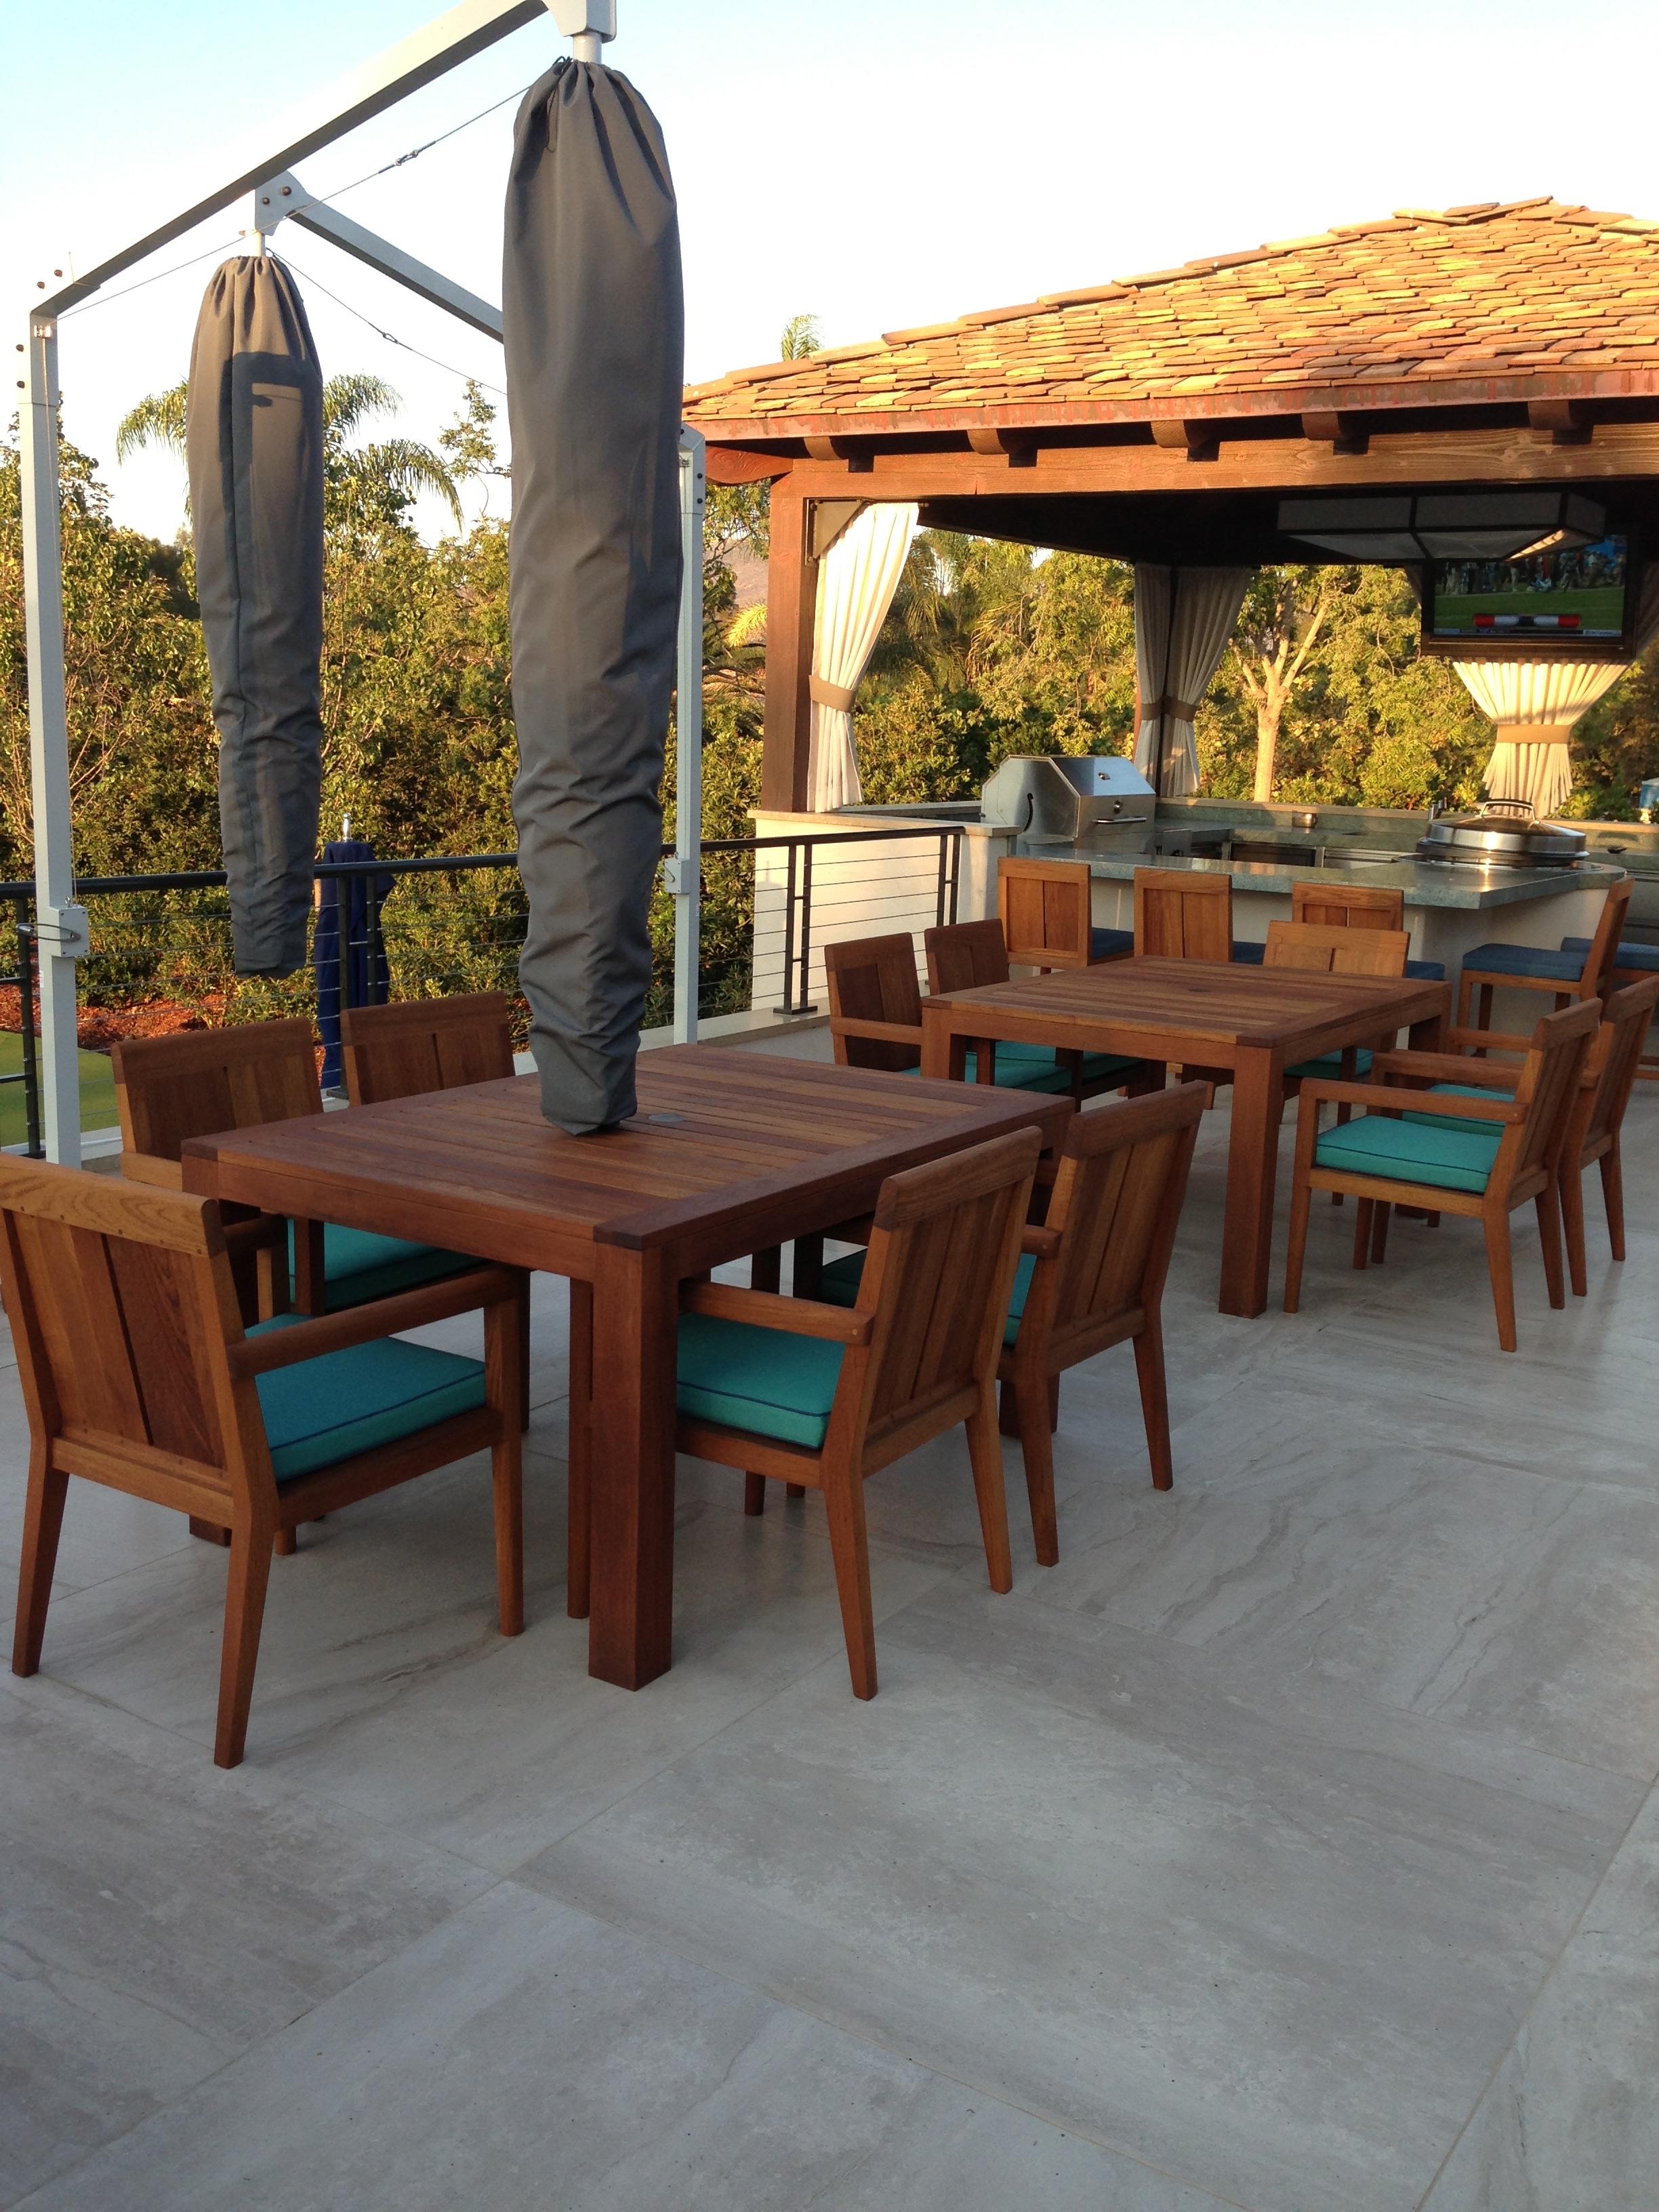 Outdoor social furniture